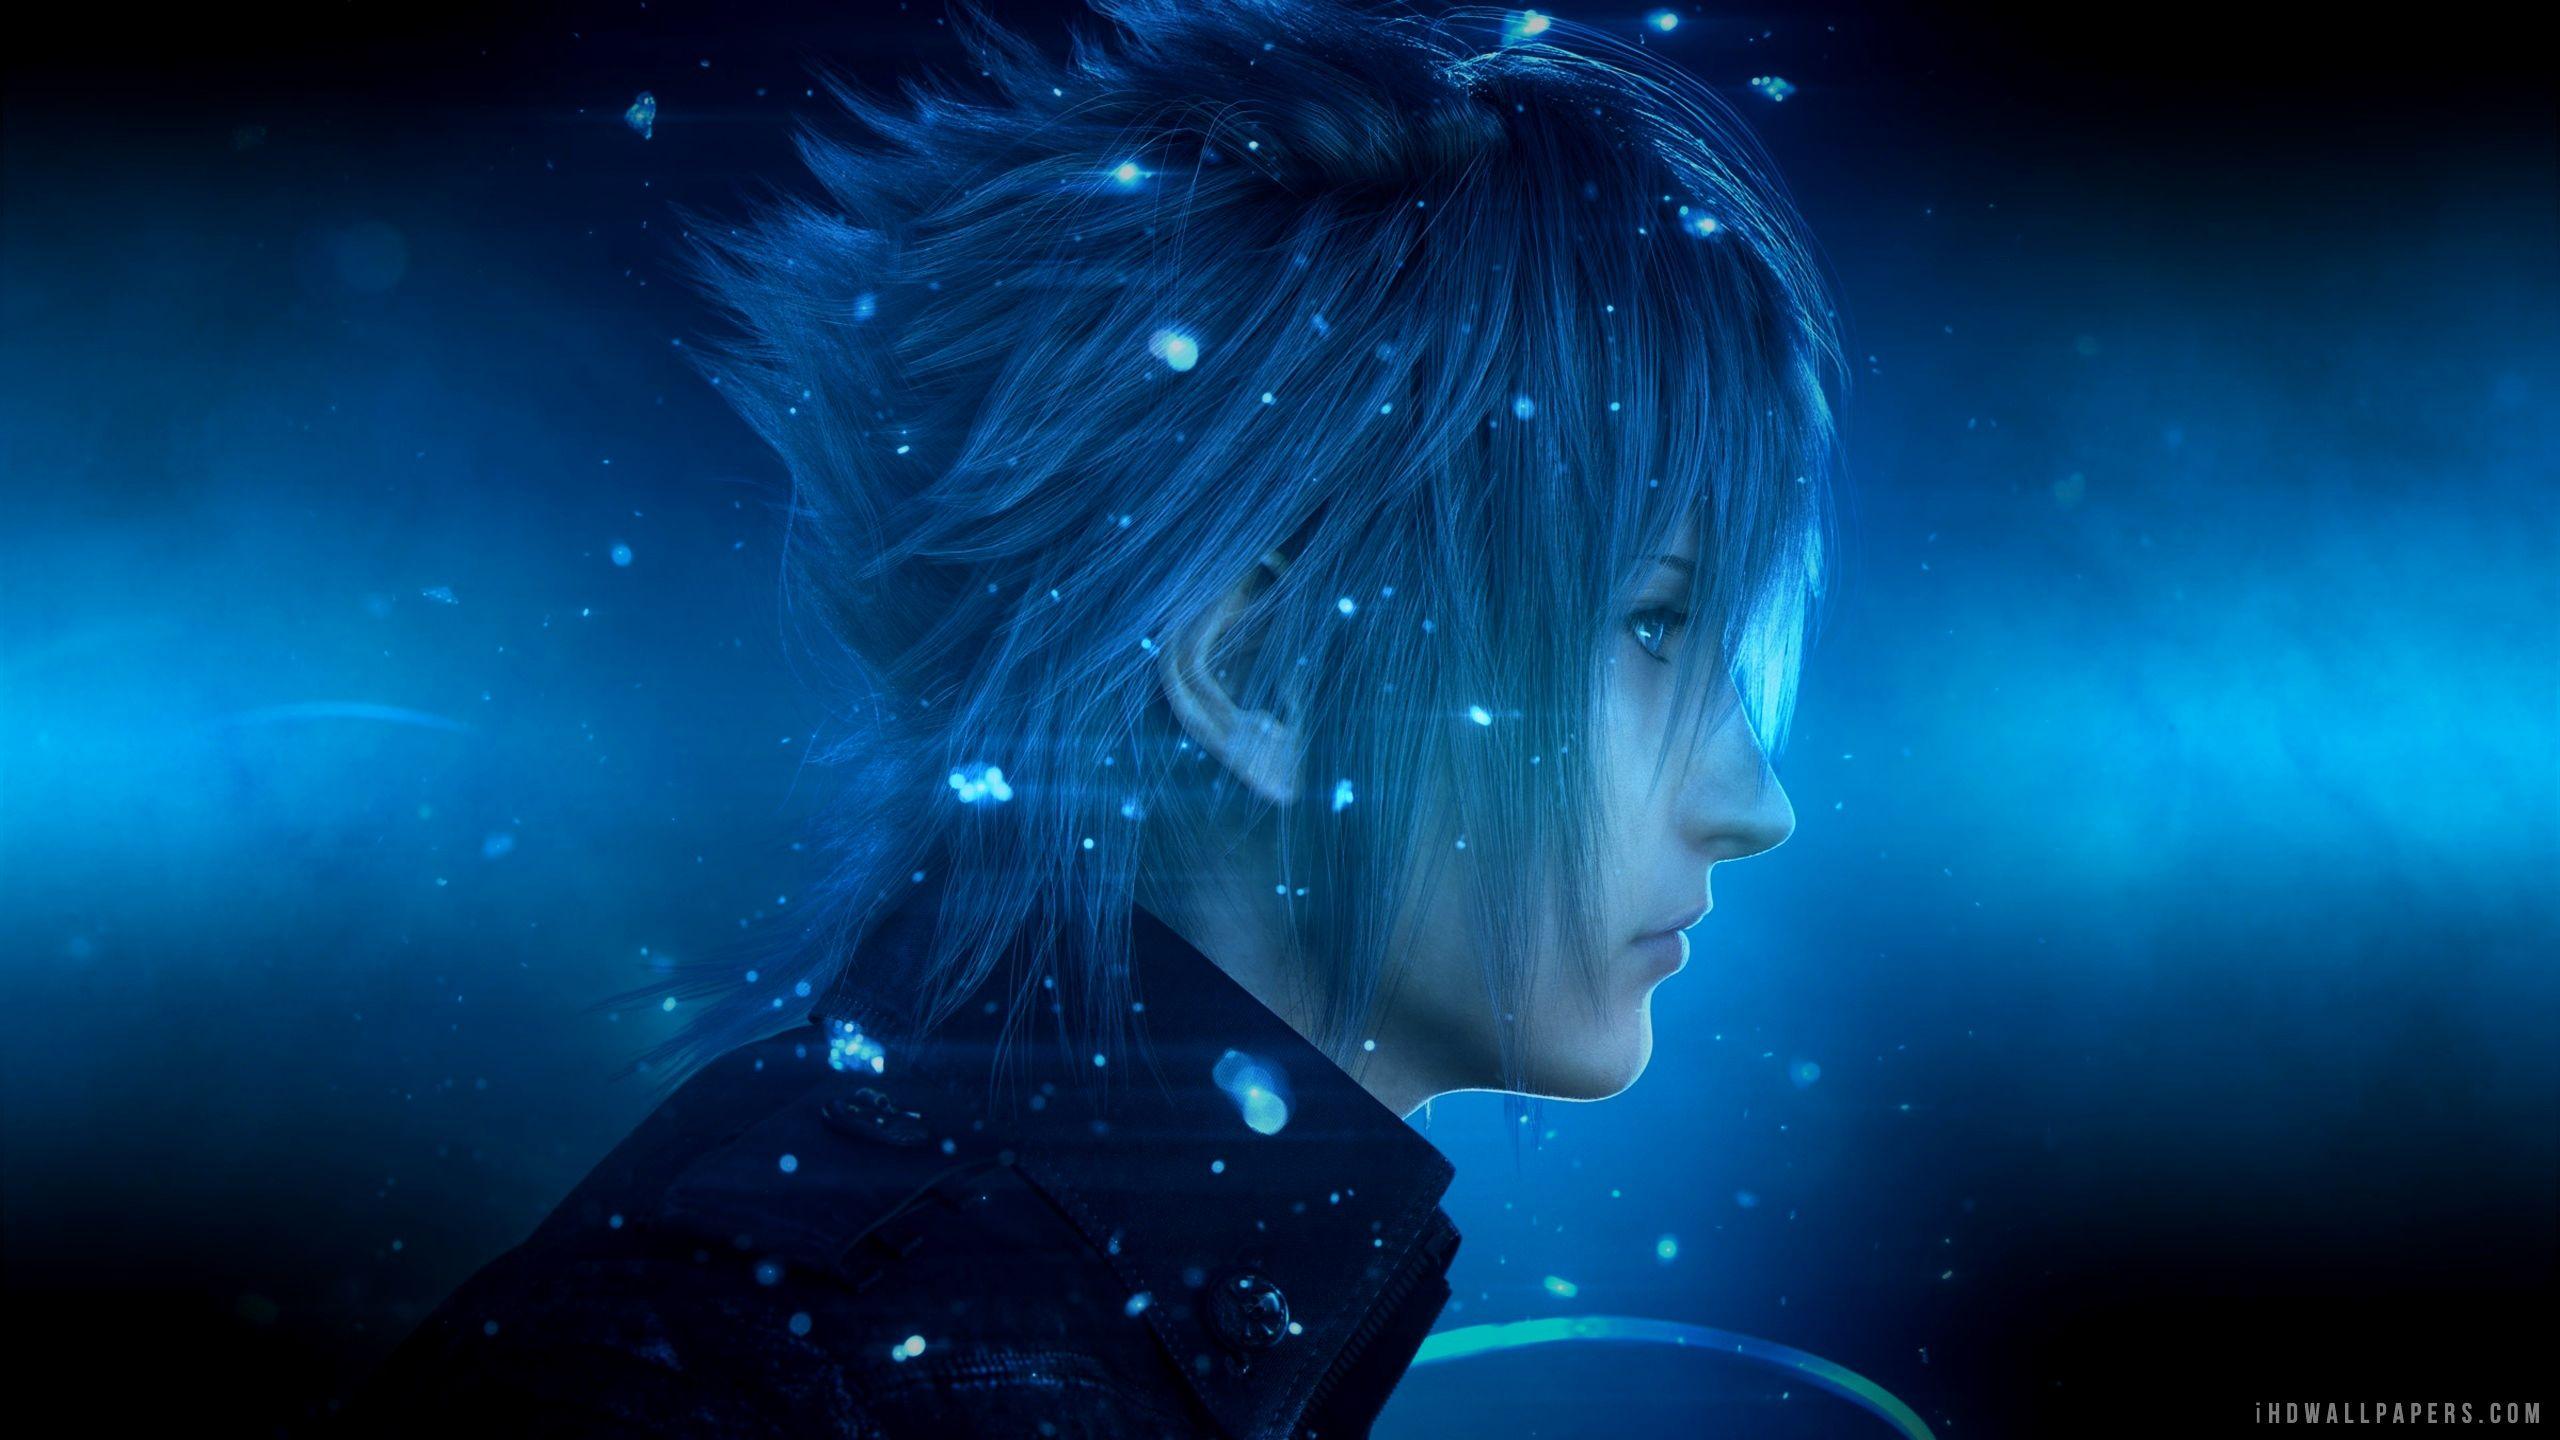 Final Fantasy Xv Wallpaper 4k Pc Trick Di 2020 Tabata Tecnologia Video